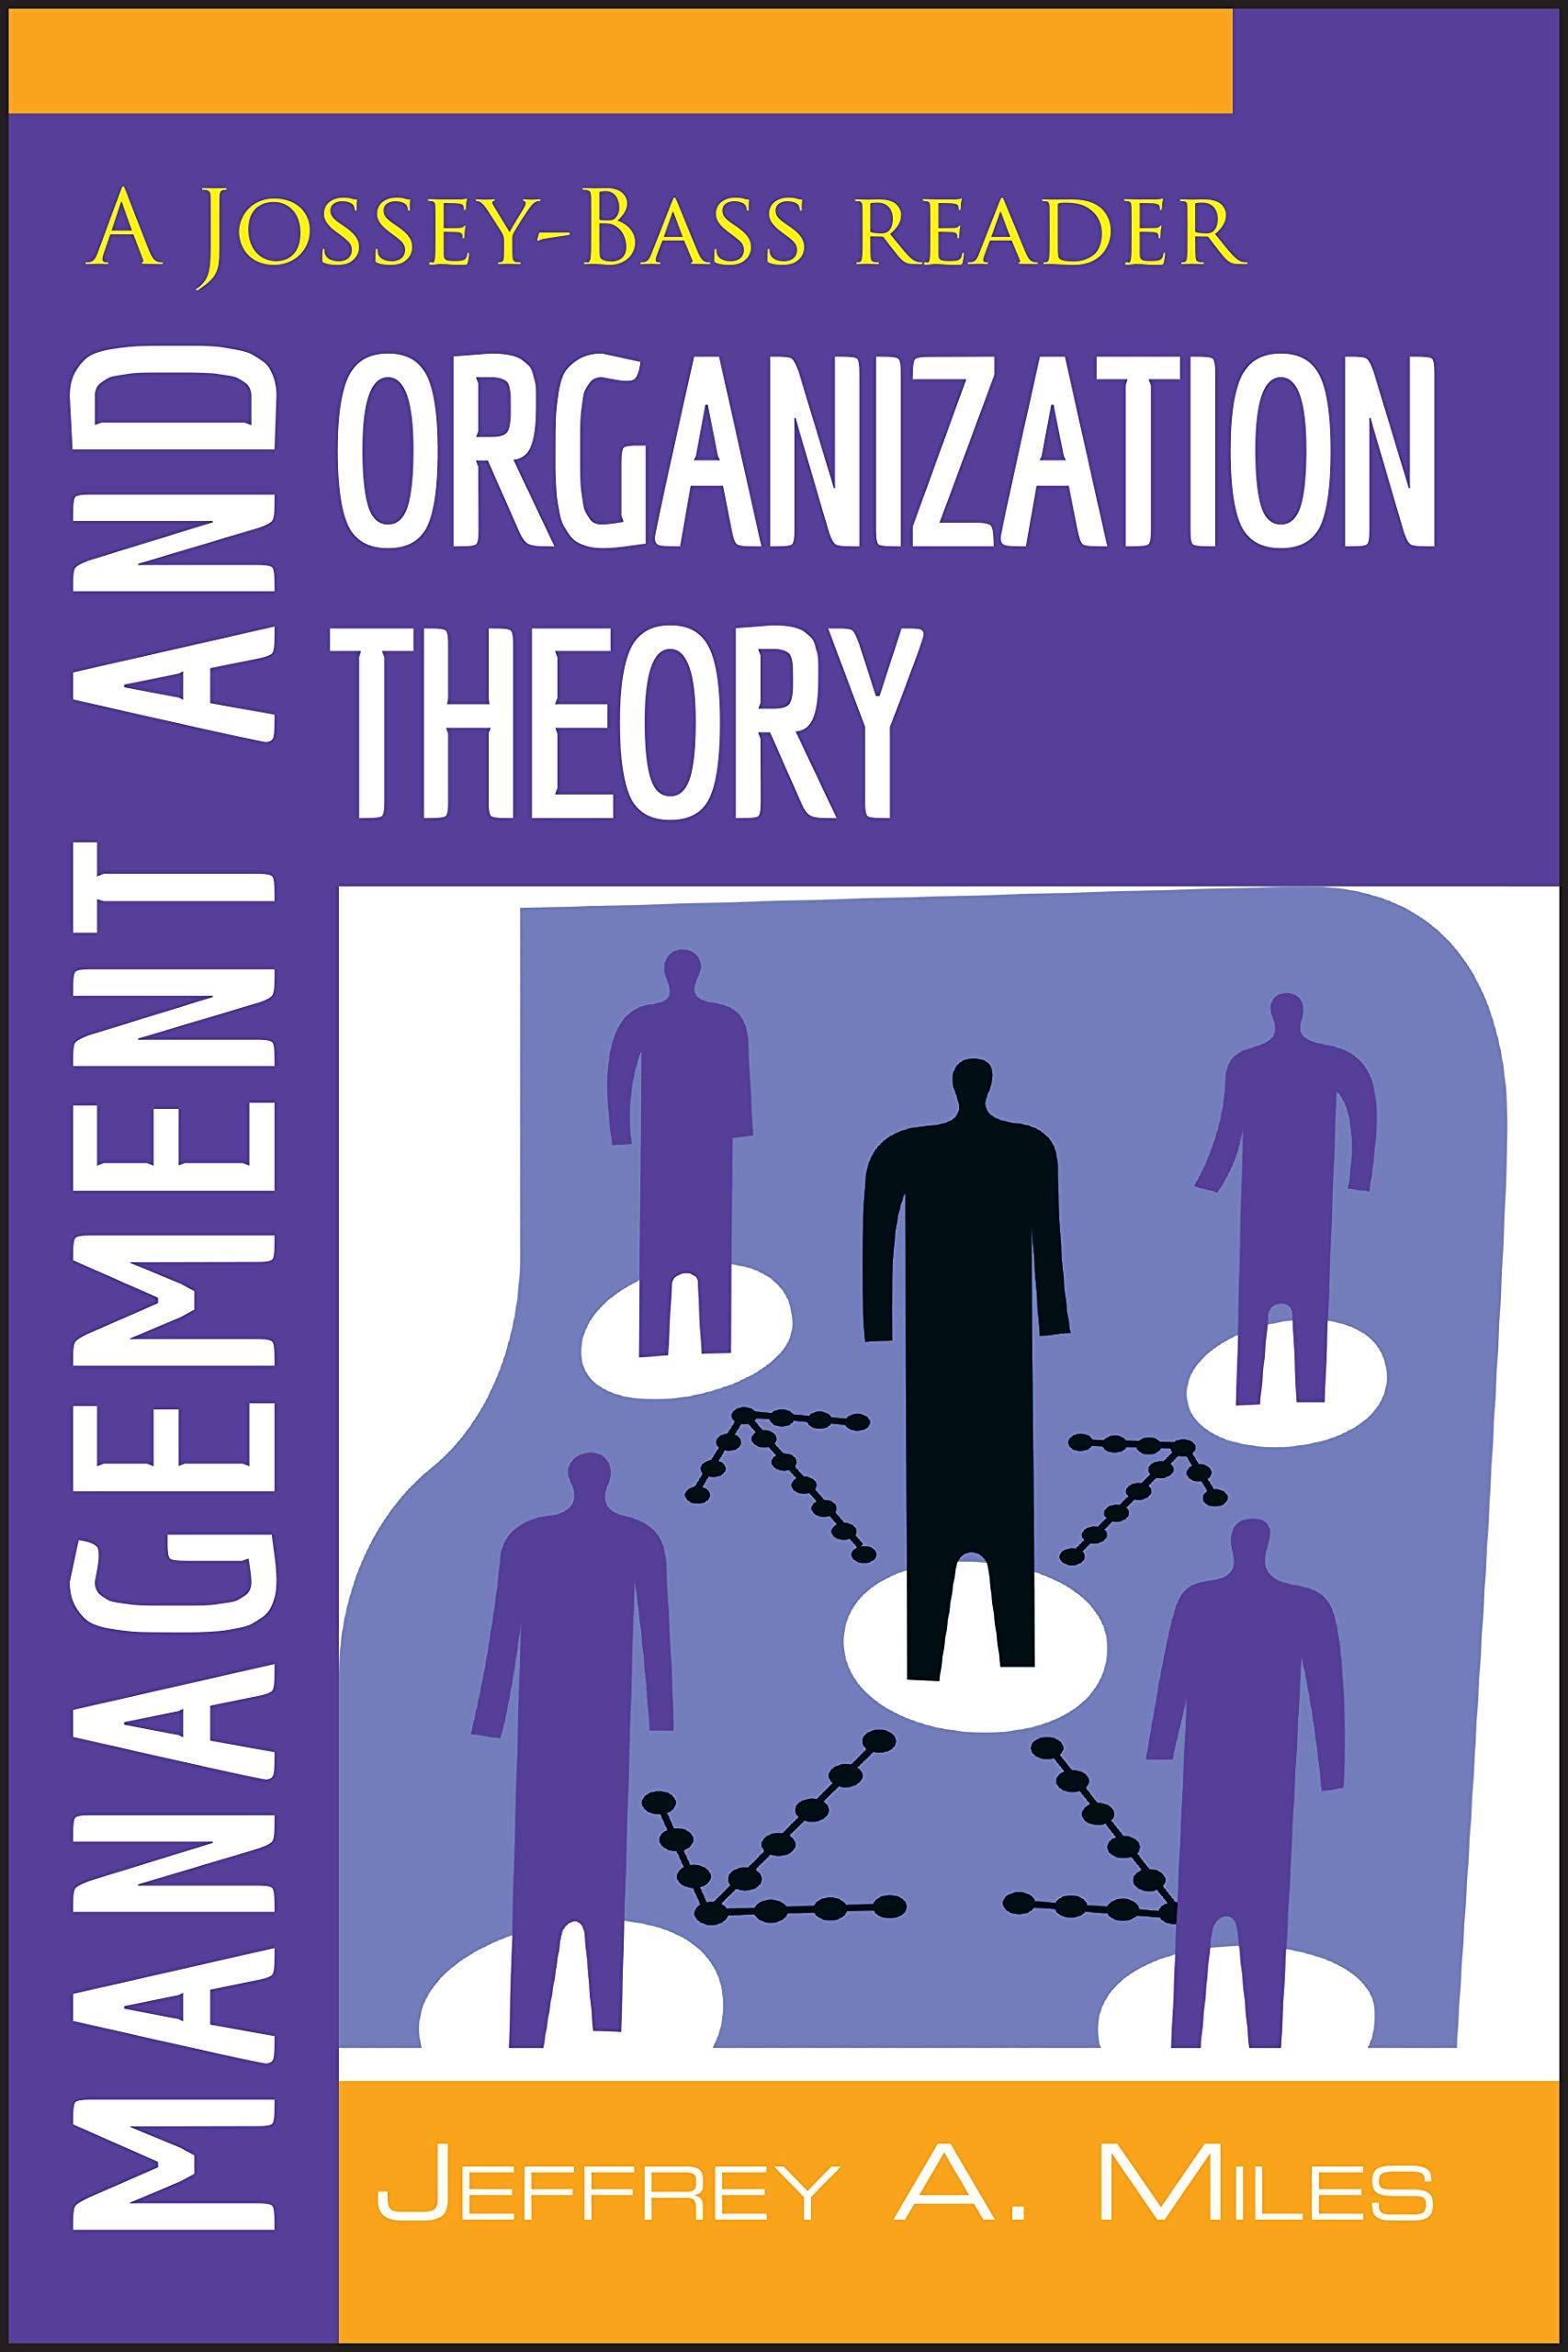 Management And Organization Theory A Jossey Bass Reader Miles Jeffrey A 9781118008959 Books Amazon Ca